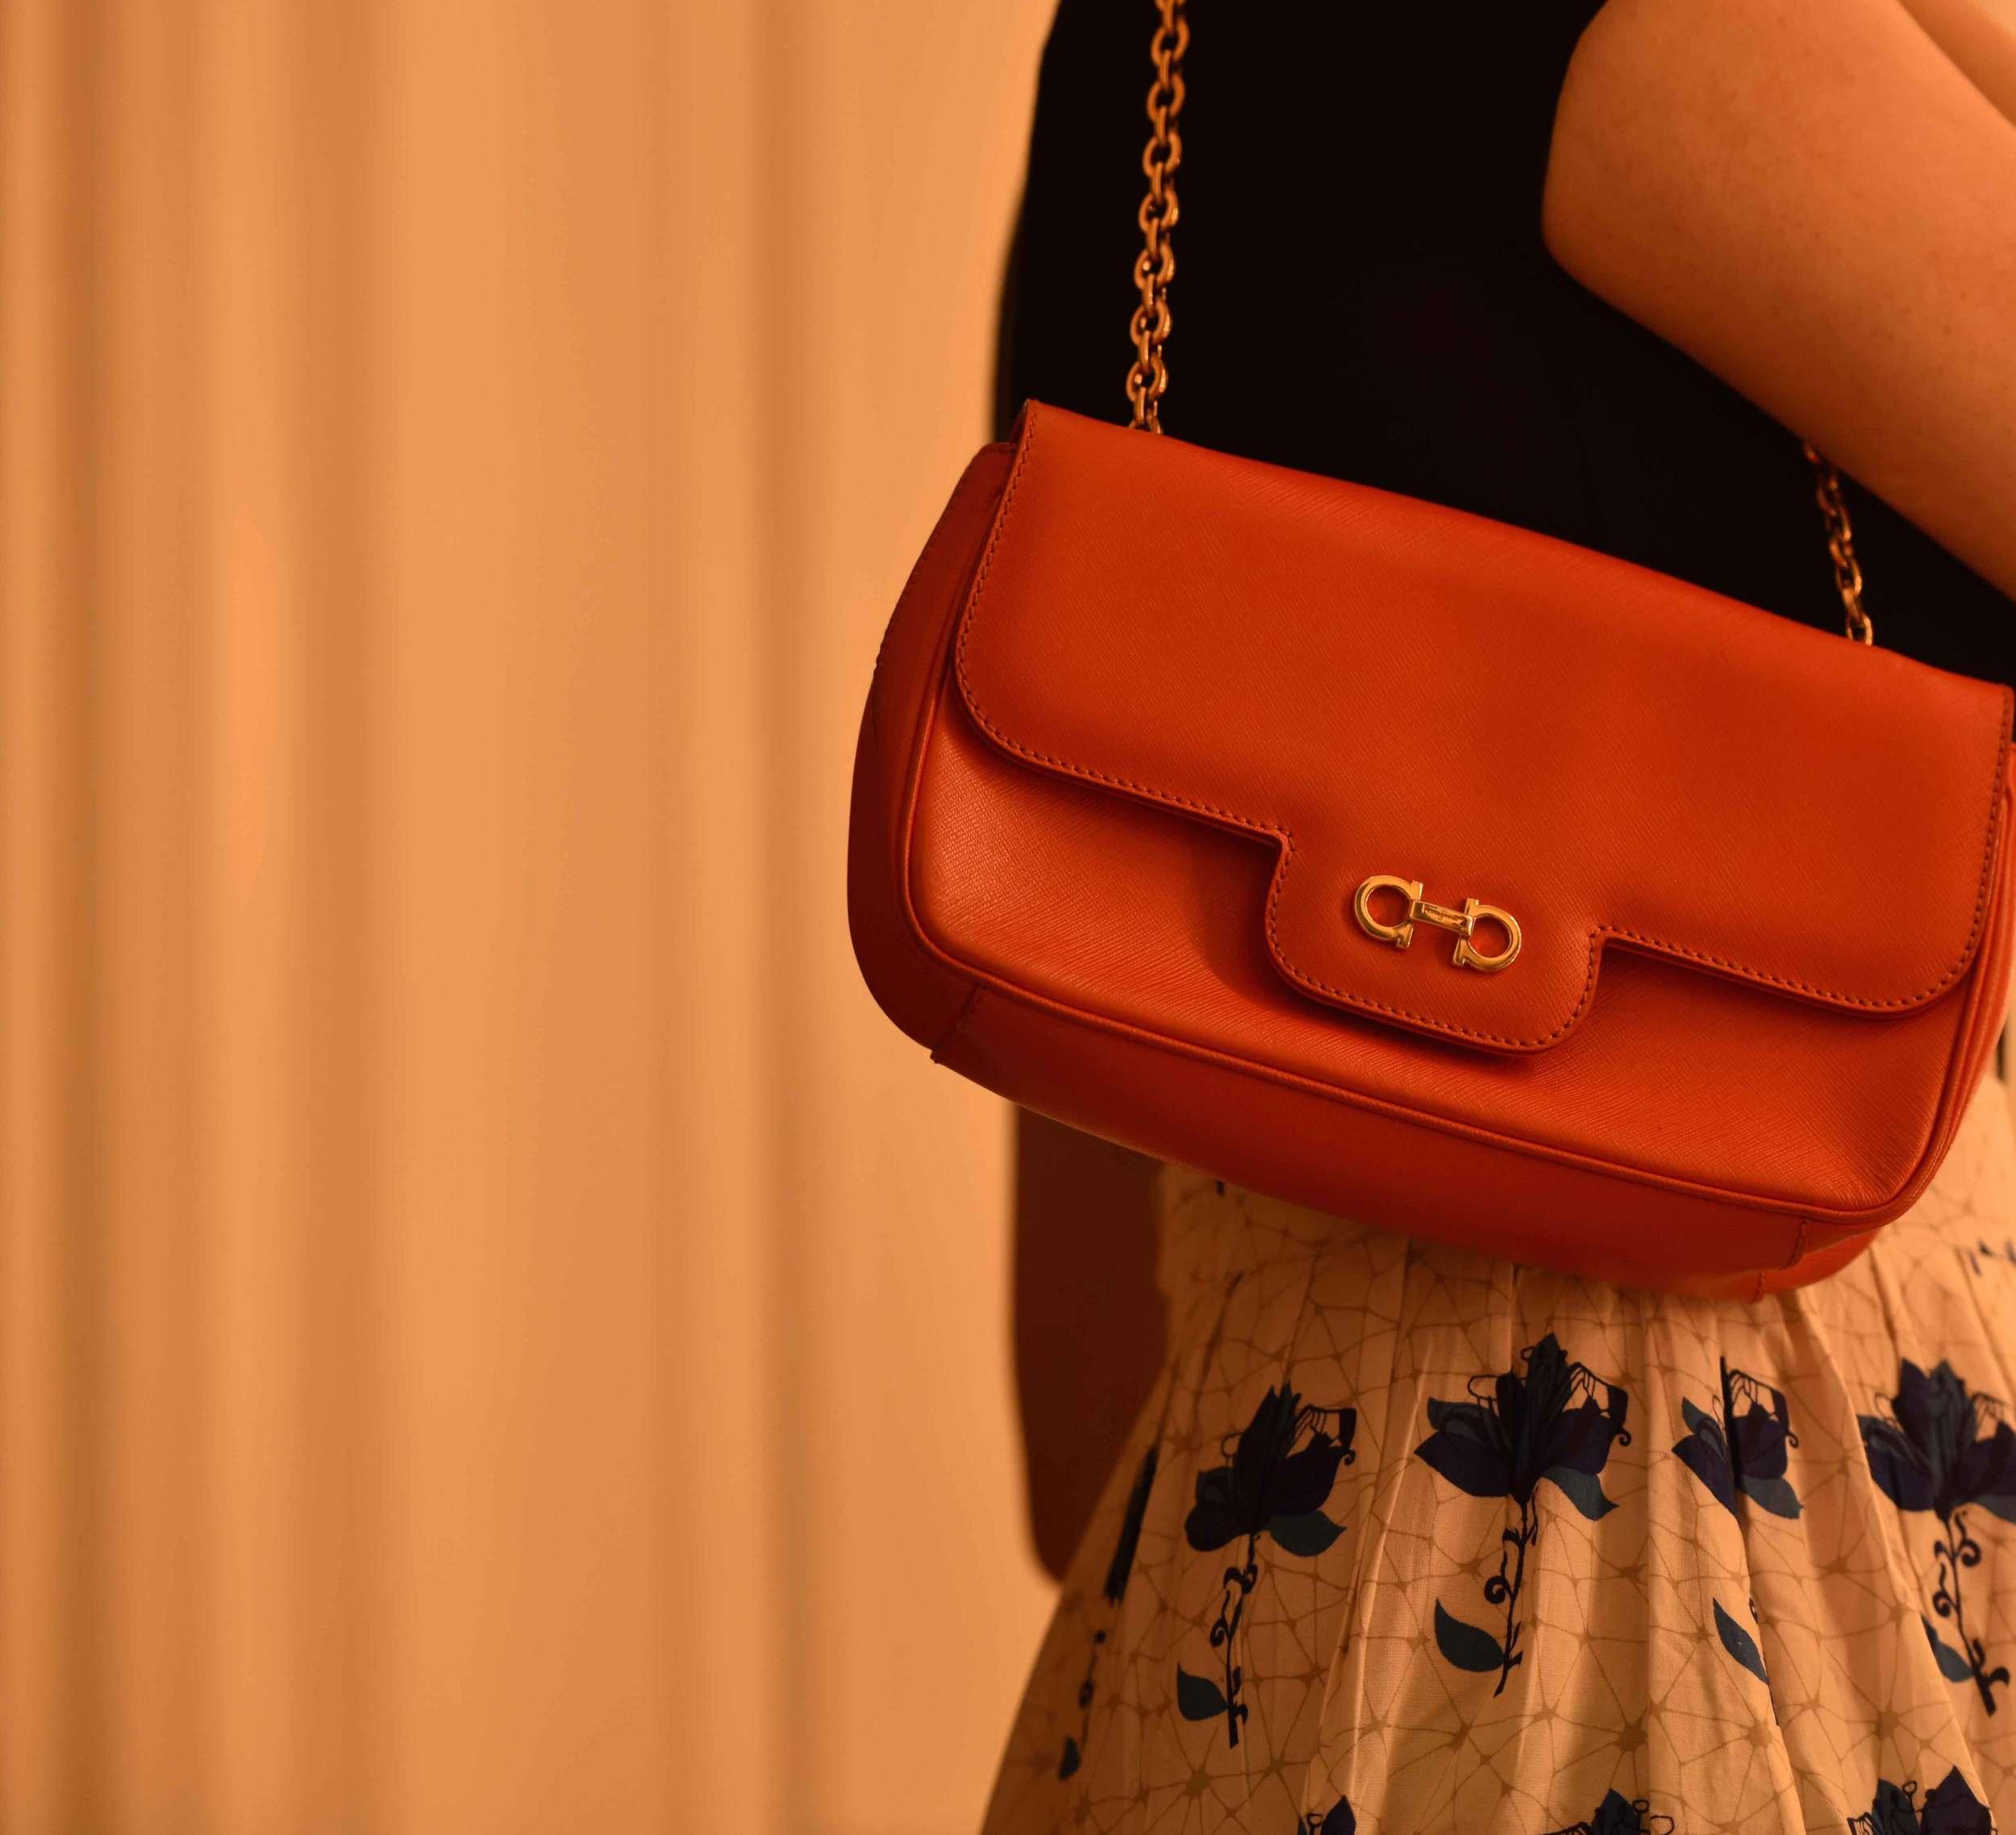 Getting romantic with a Ferragamo bag. Image©gunjanvirk